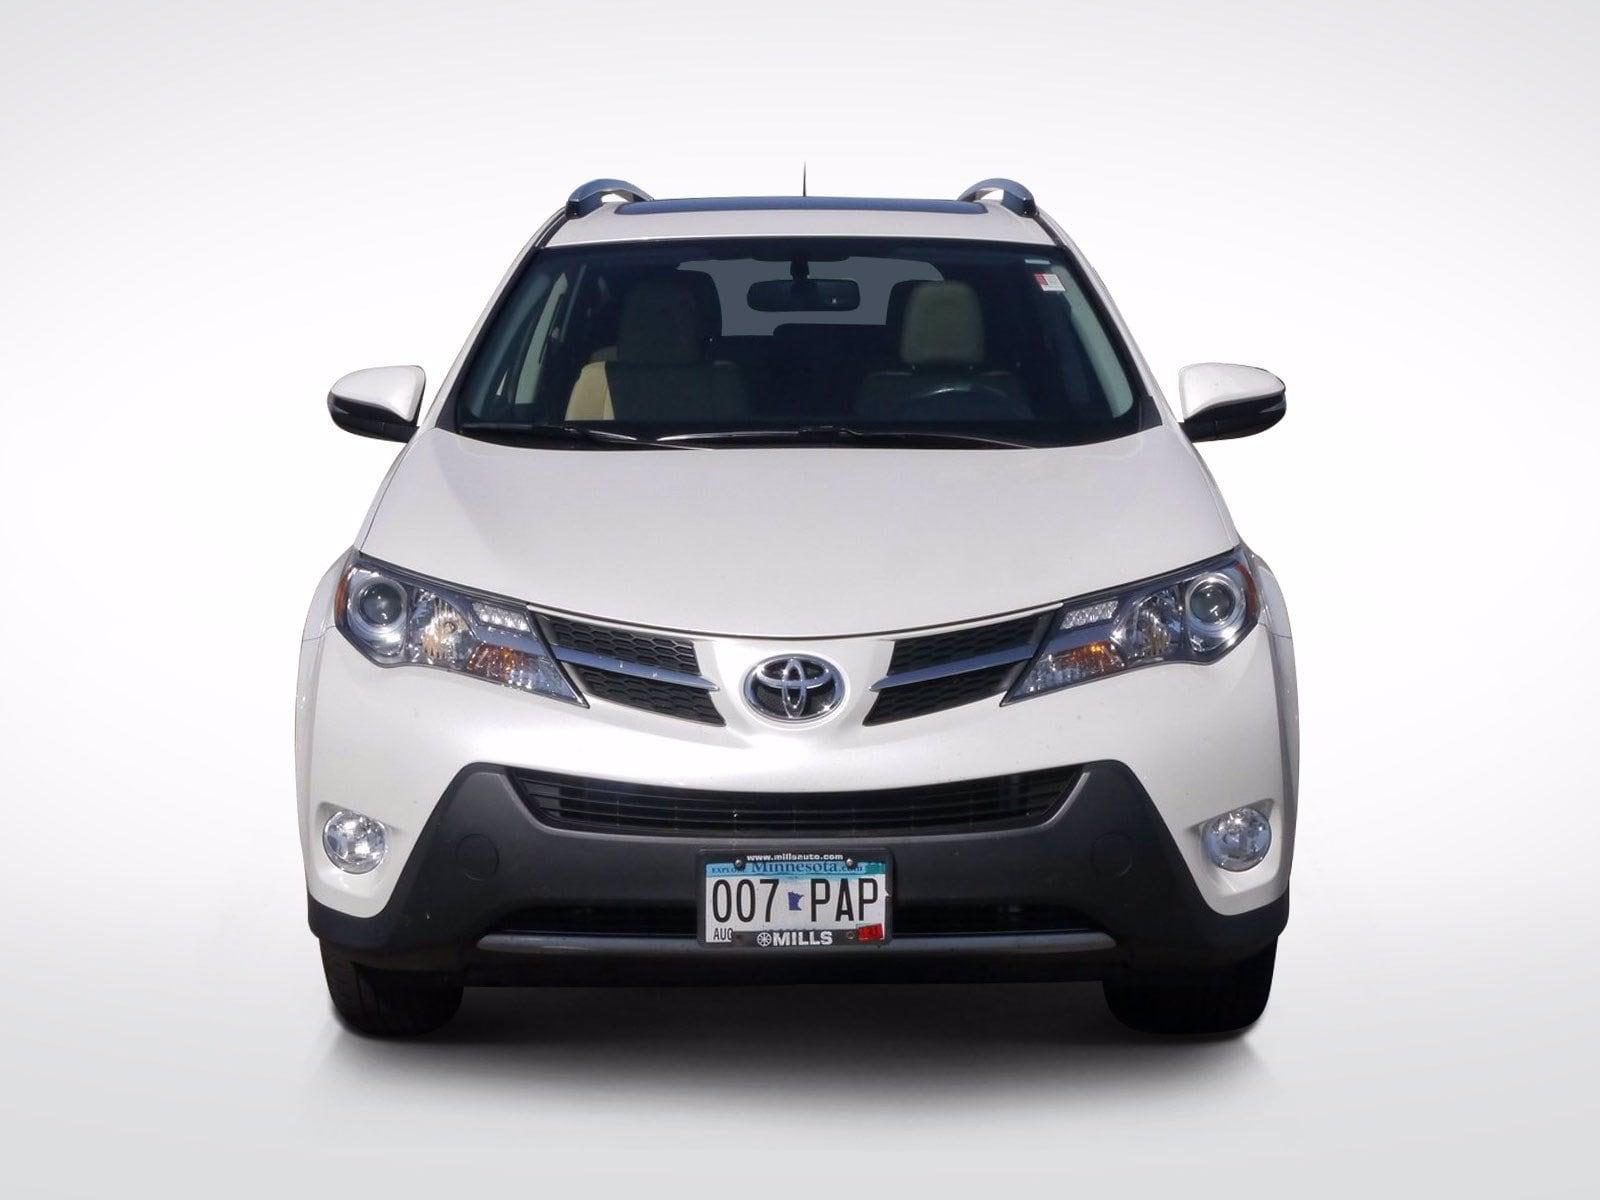 Used 2014 Toyota RAV4 Limited with VIN JTMDFREV5ED085765 for sale in Baxter, Minnesota